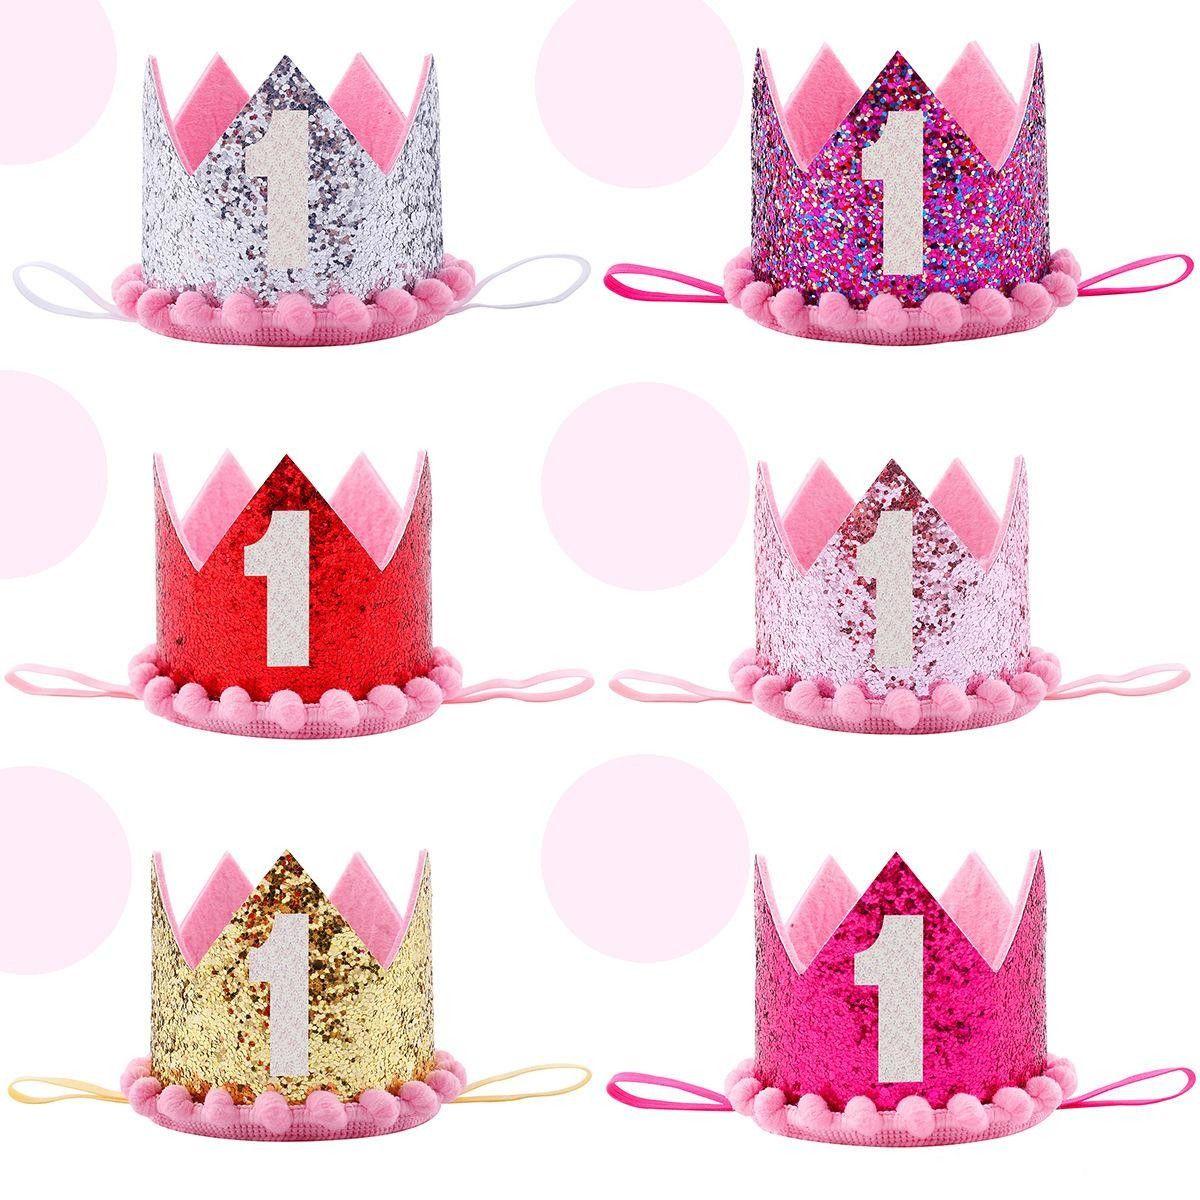 Compre Niño Azul Plata Primer Cumpleaños Sombrero Chica Oro Rosa Princesa  Corona Número 1 Año De Edad Sombrero Fiesta Glitter Cumpleaños Diadema A   1.53 Del ... f9284e44446